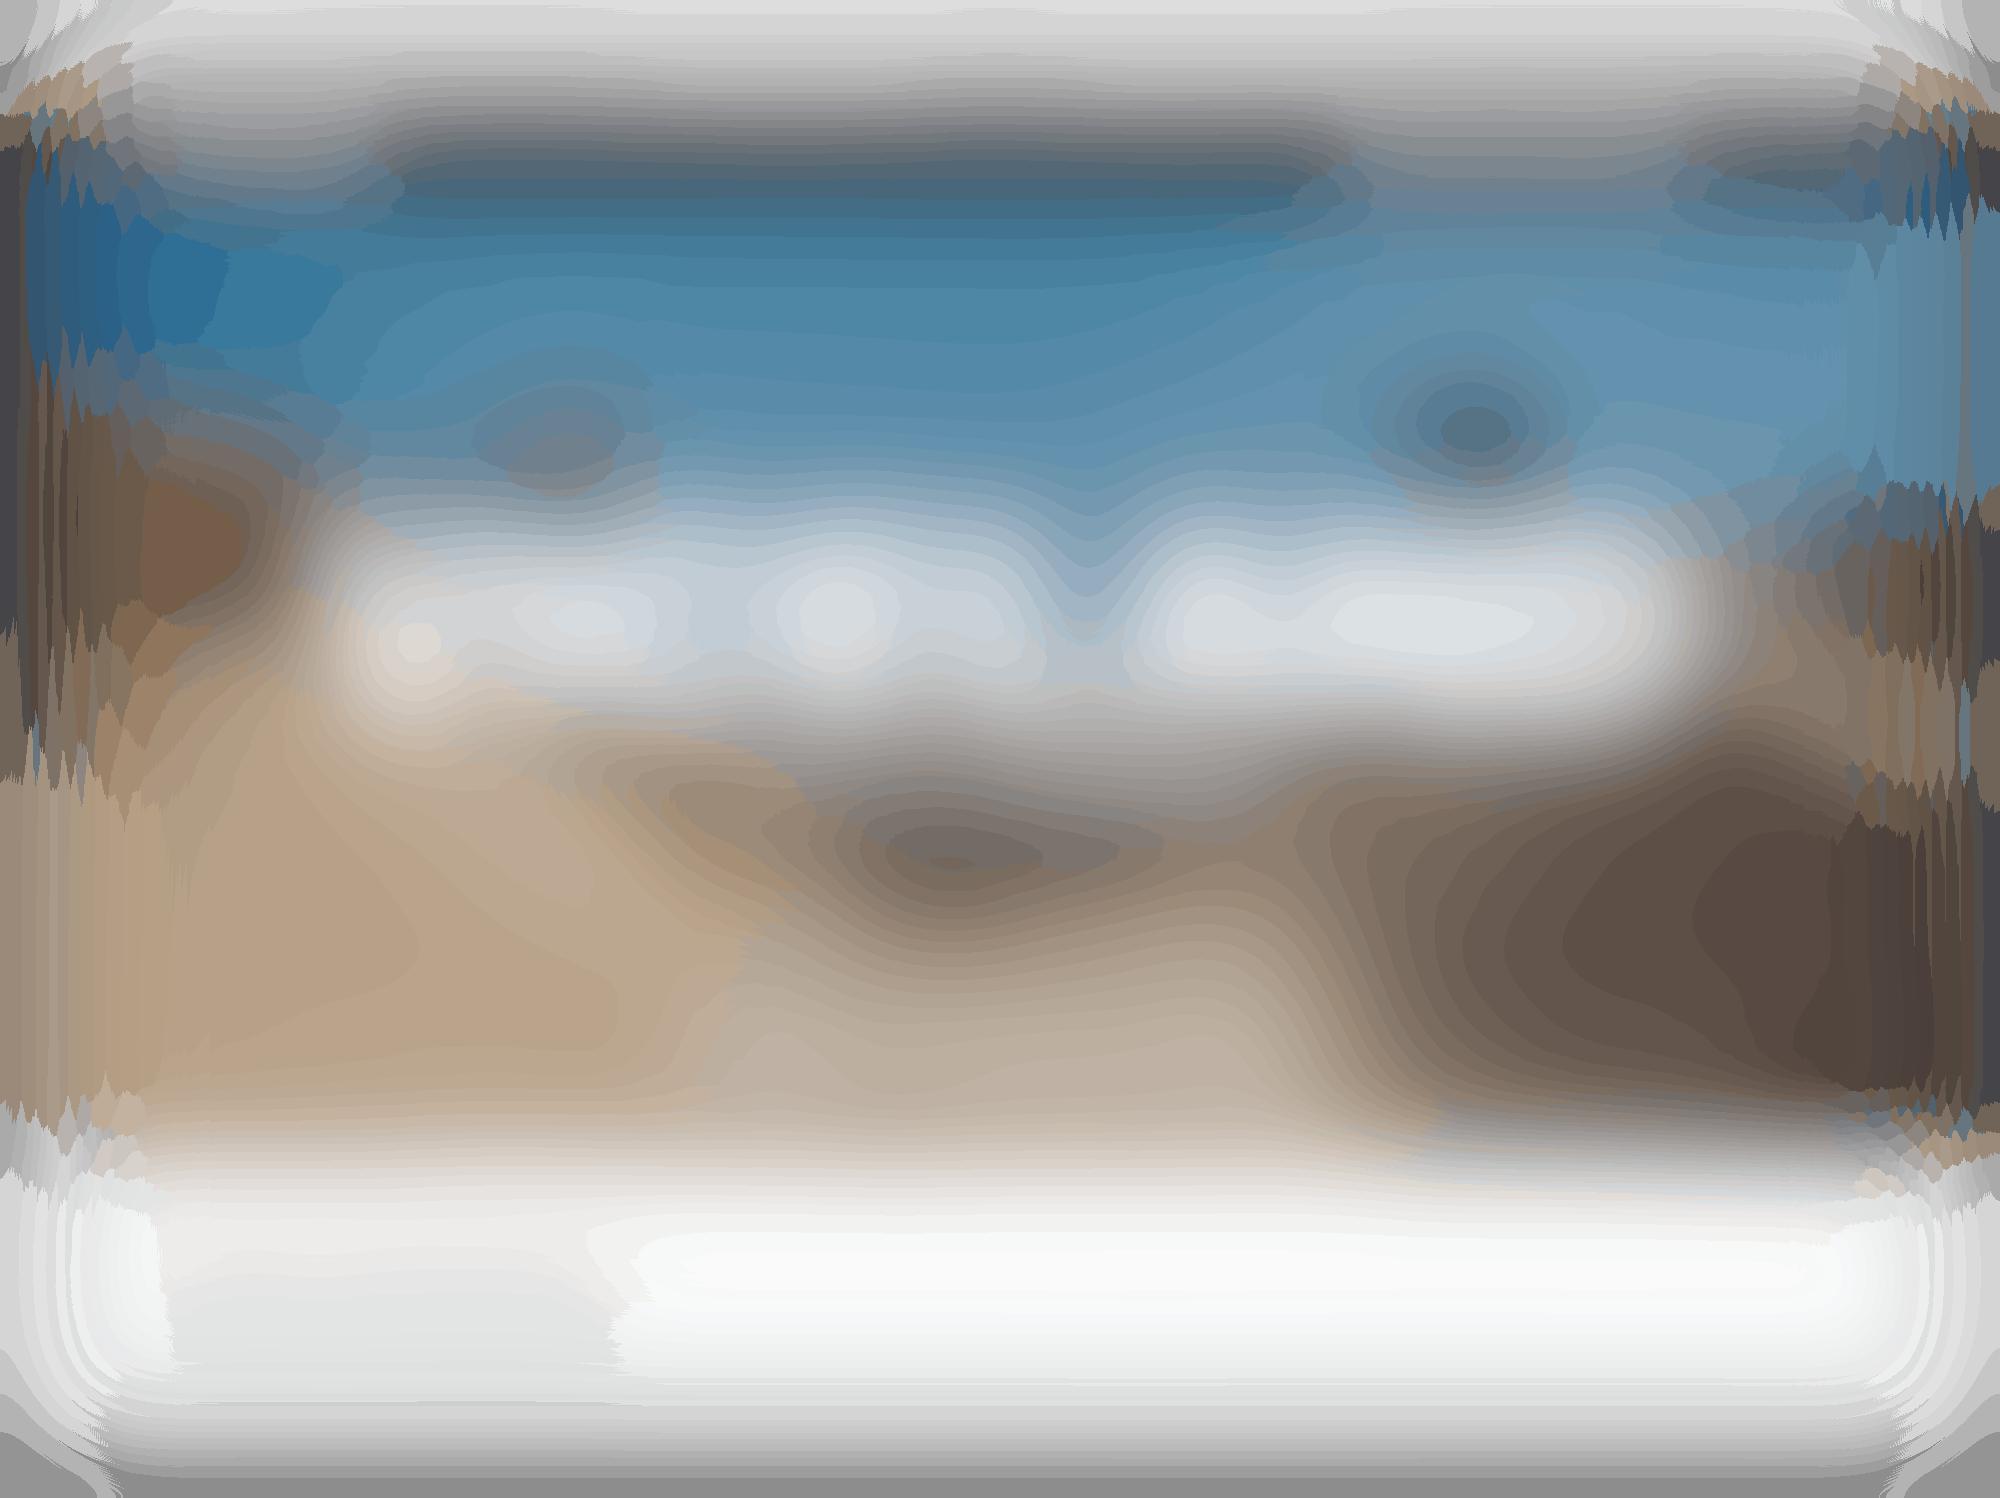 Viceland 2 autocompressfitresizeixlibphp 1 1 0max h2000max w3 D2000q80sbada8c4a09955b9d2613ad2b3e5392b8